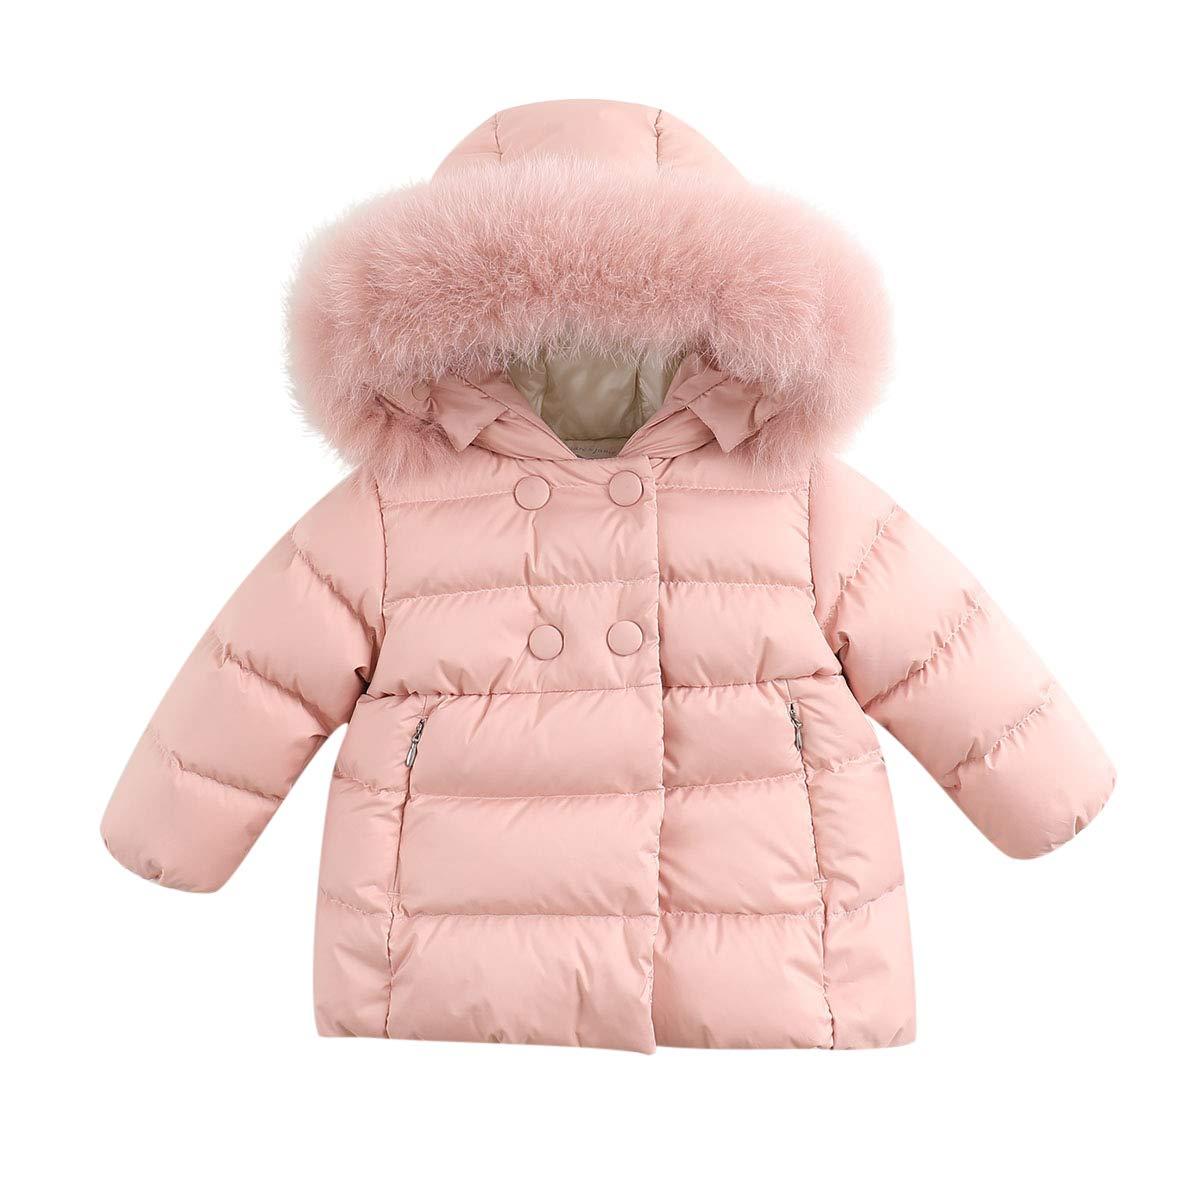 marc janie OUTERWEAR ベビーガールズ 18 Months (73 cm) Smoky Pink B07K6KM9G7